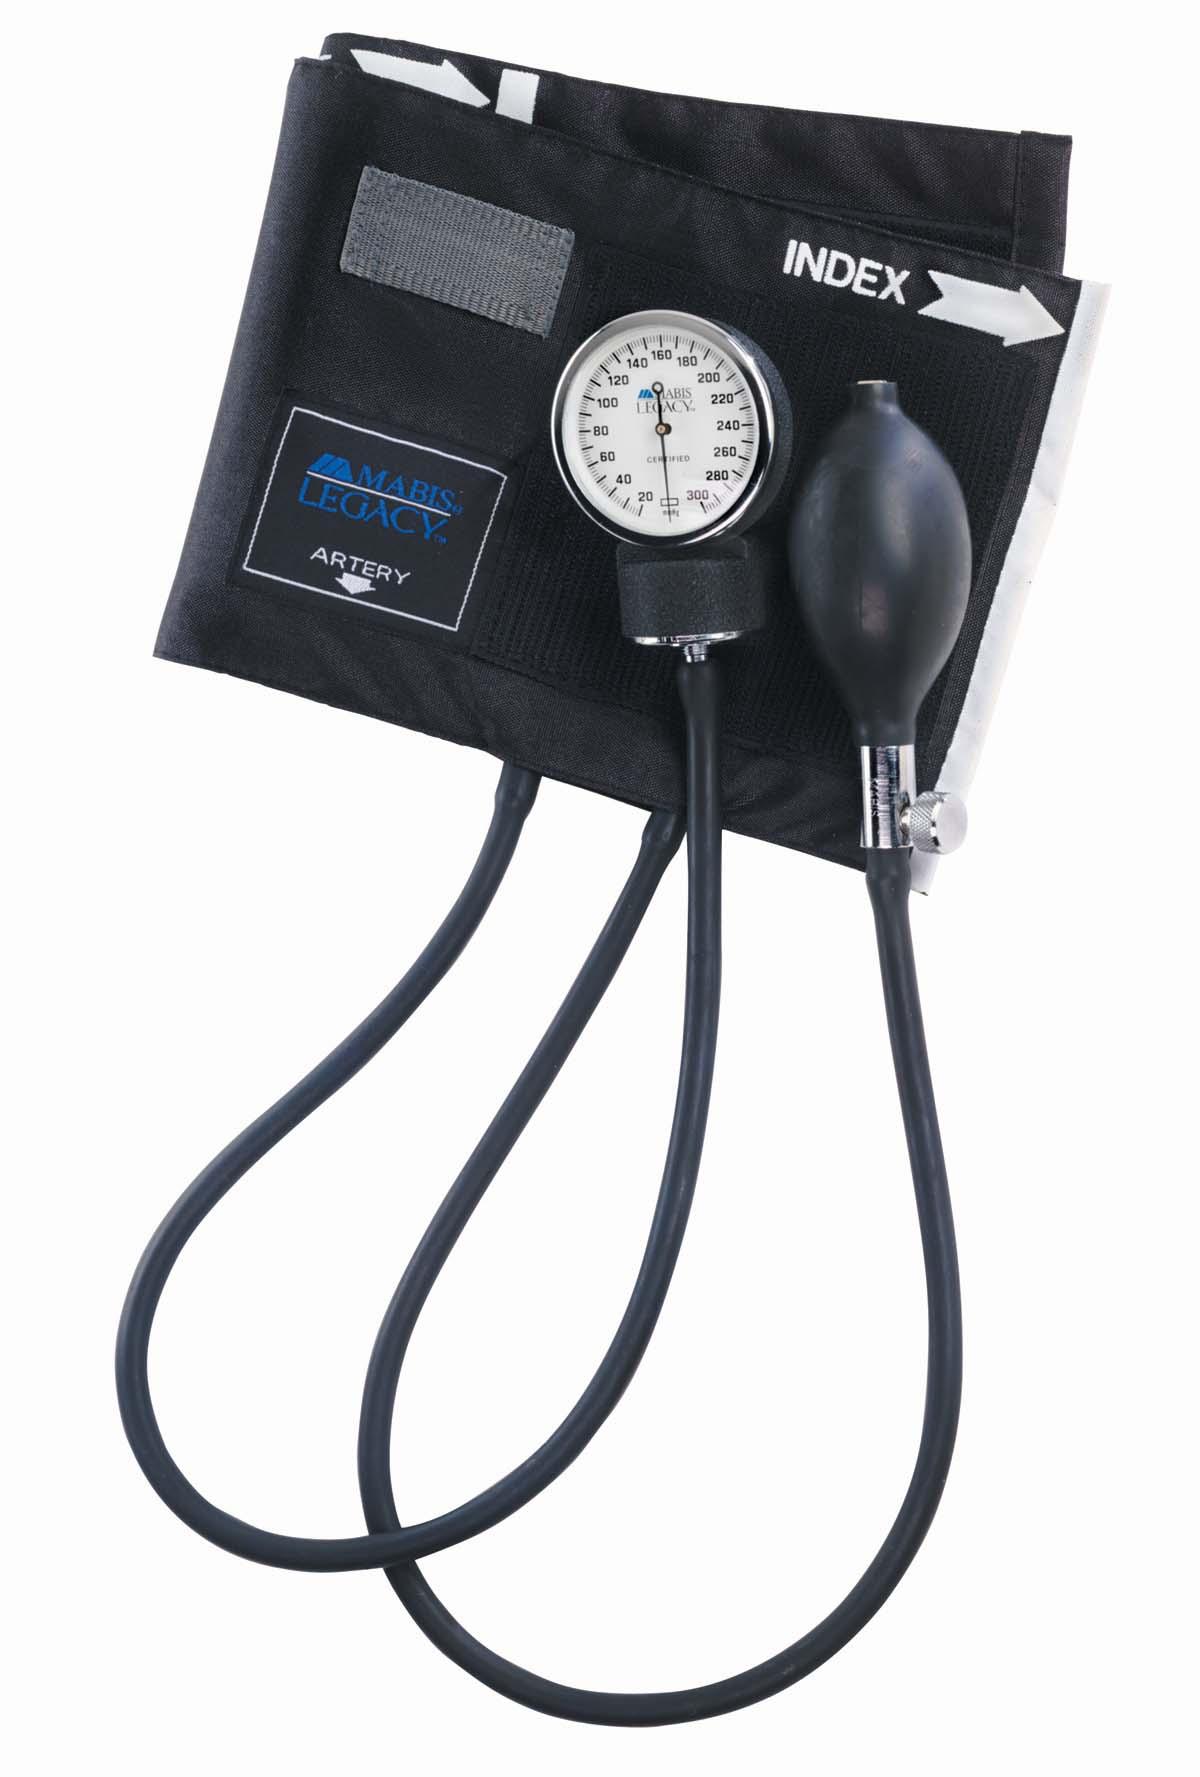 legacy-aneroid-sphygmomanometer-black-nylon-cuff-thigh-01-110-027-lr.jpg